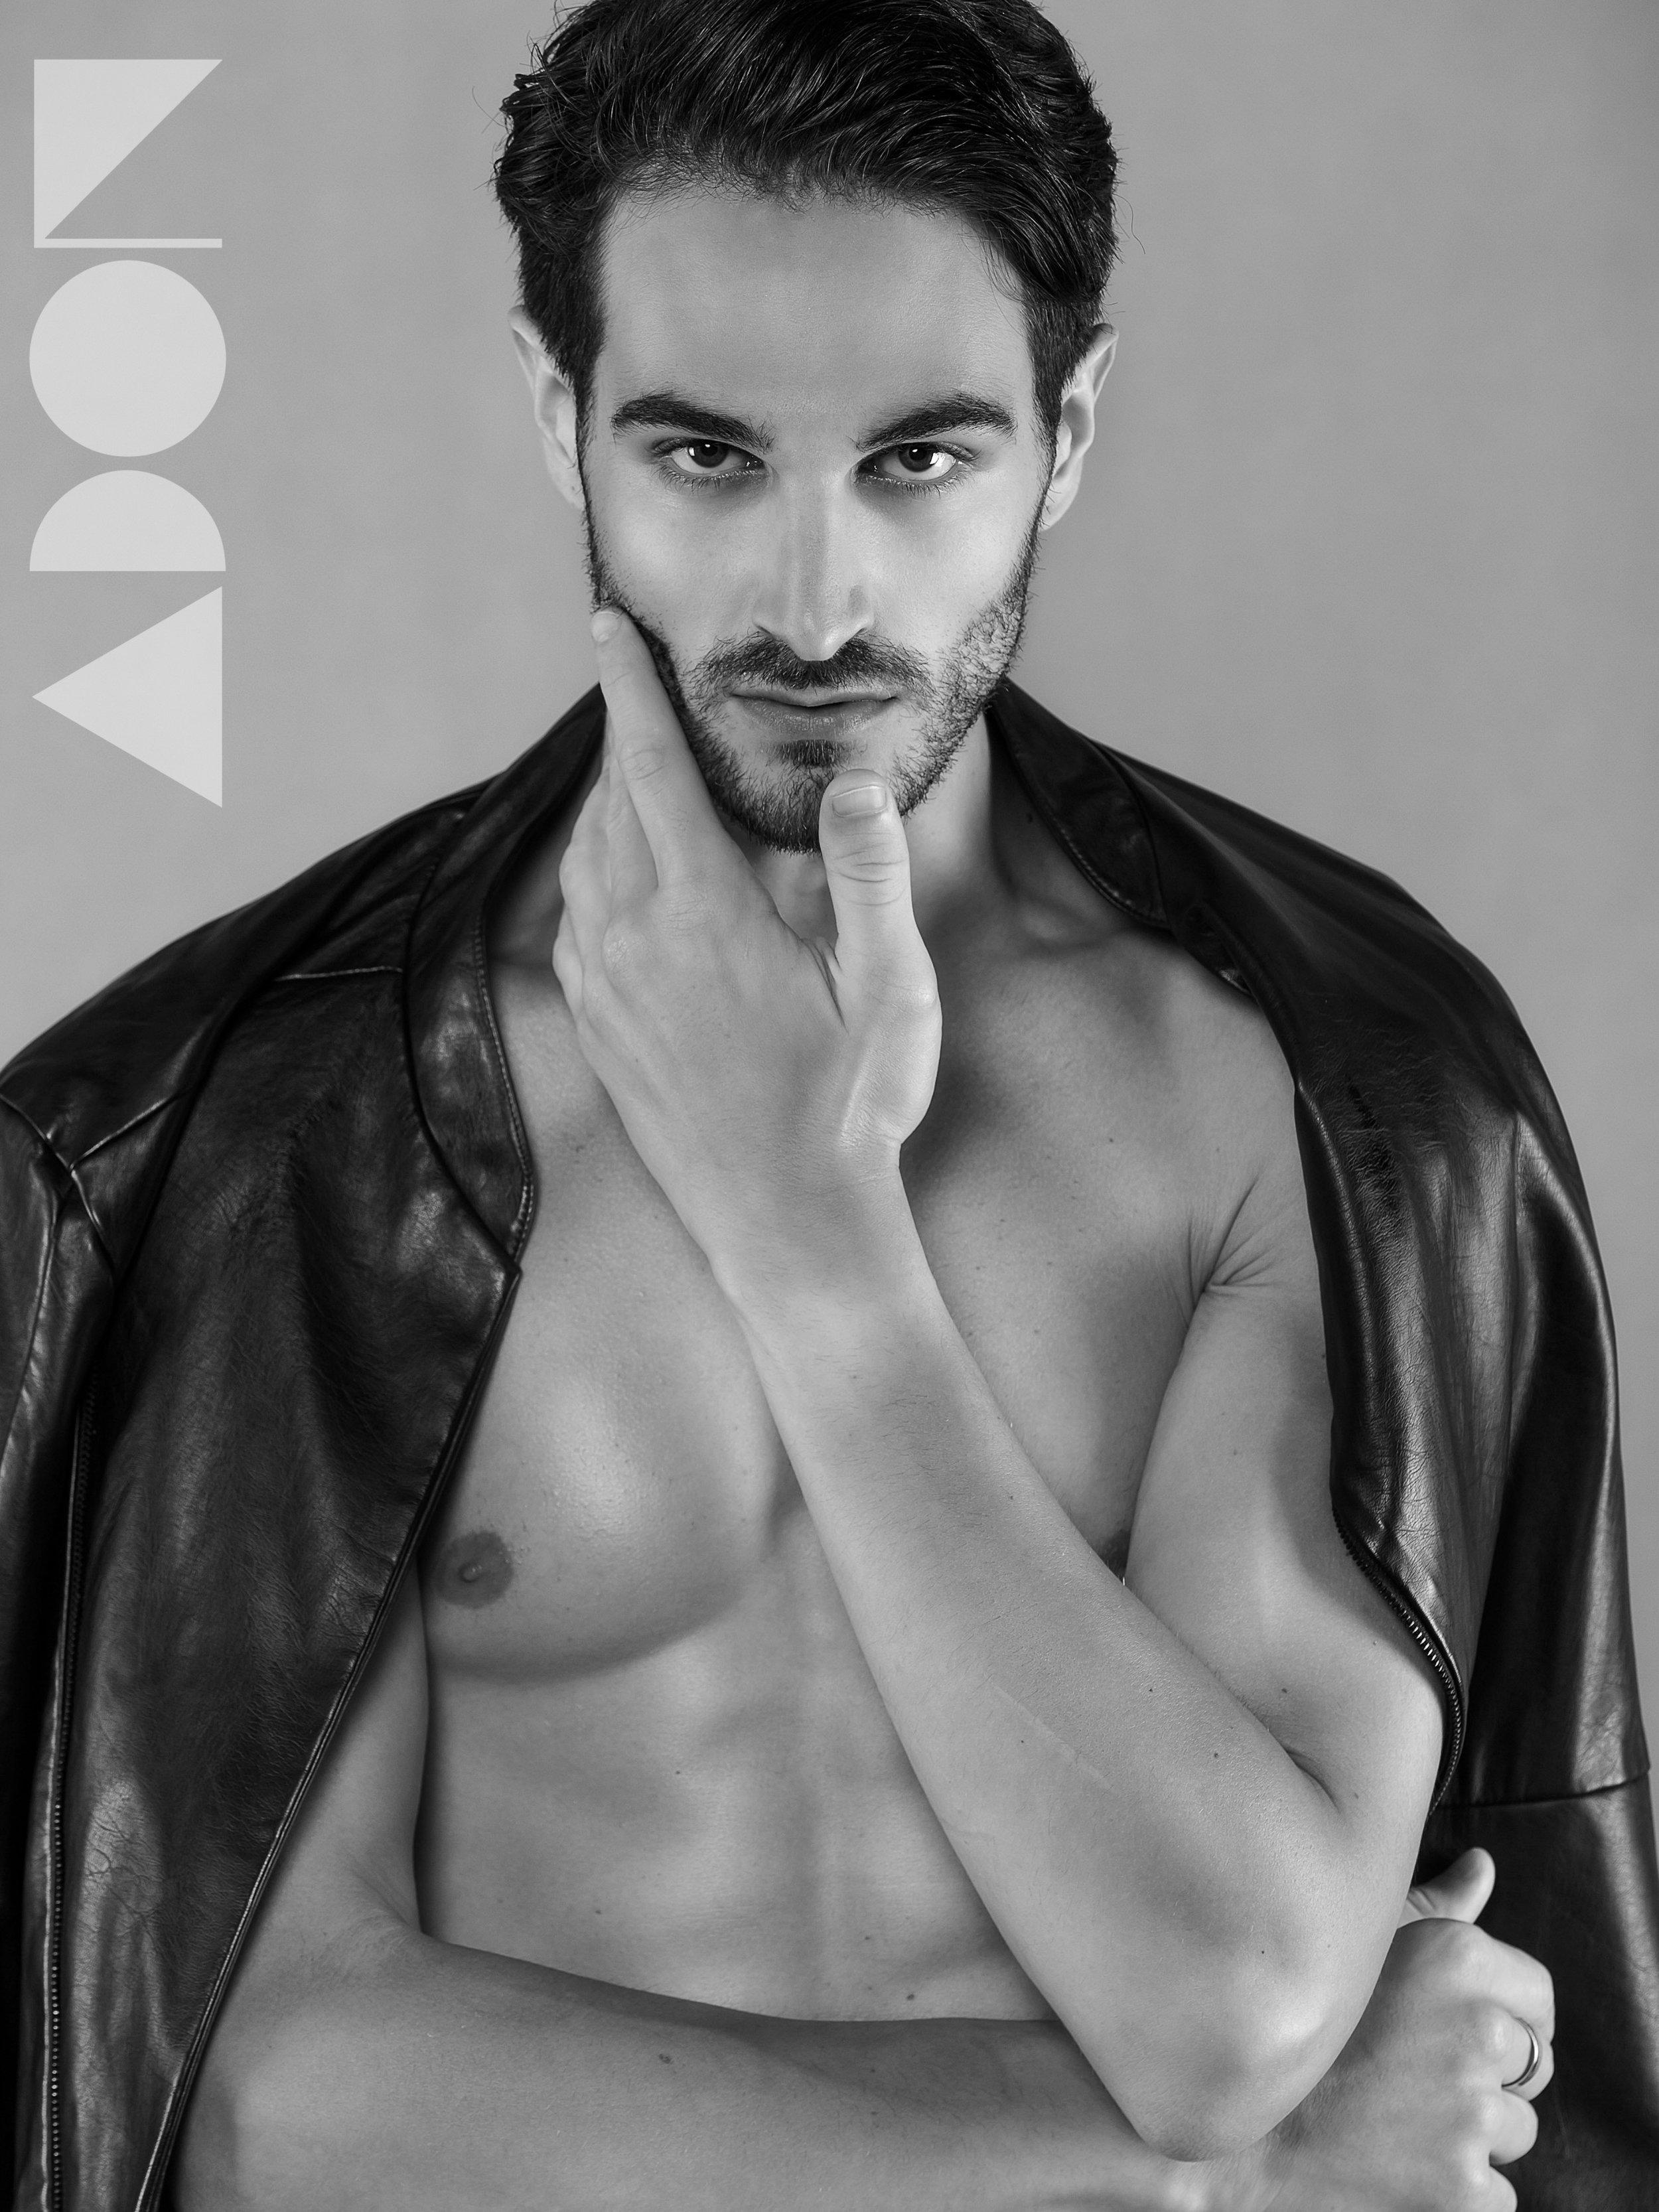 Adon Exclusive: Model Daniele Francesco Mazzola By Jason Oung